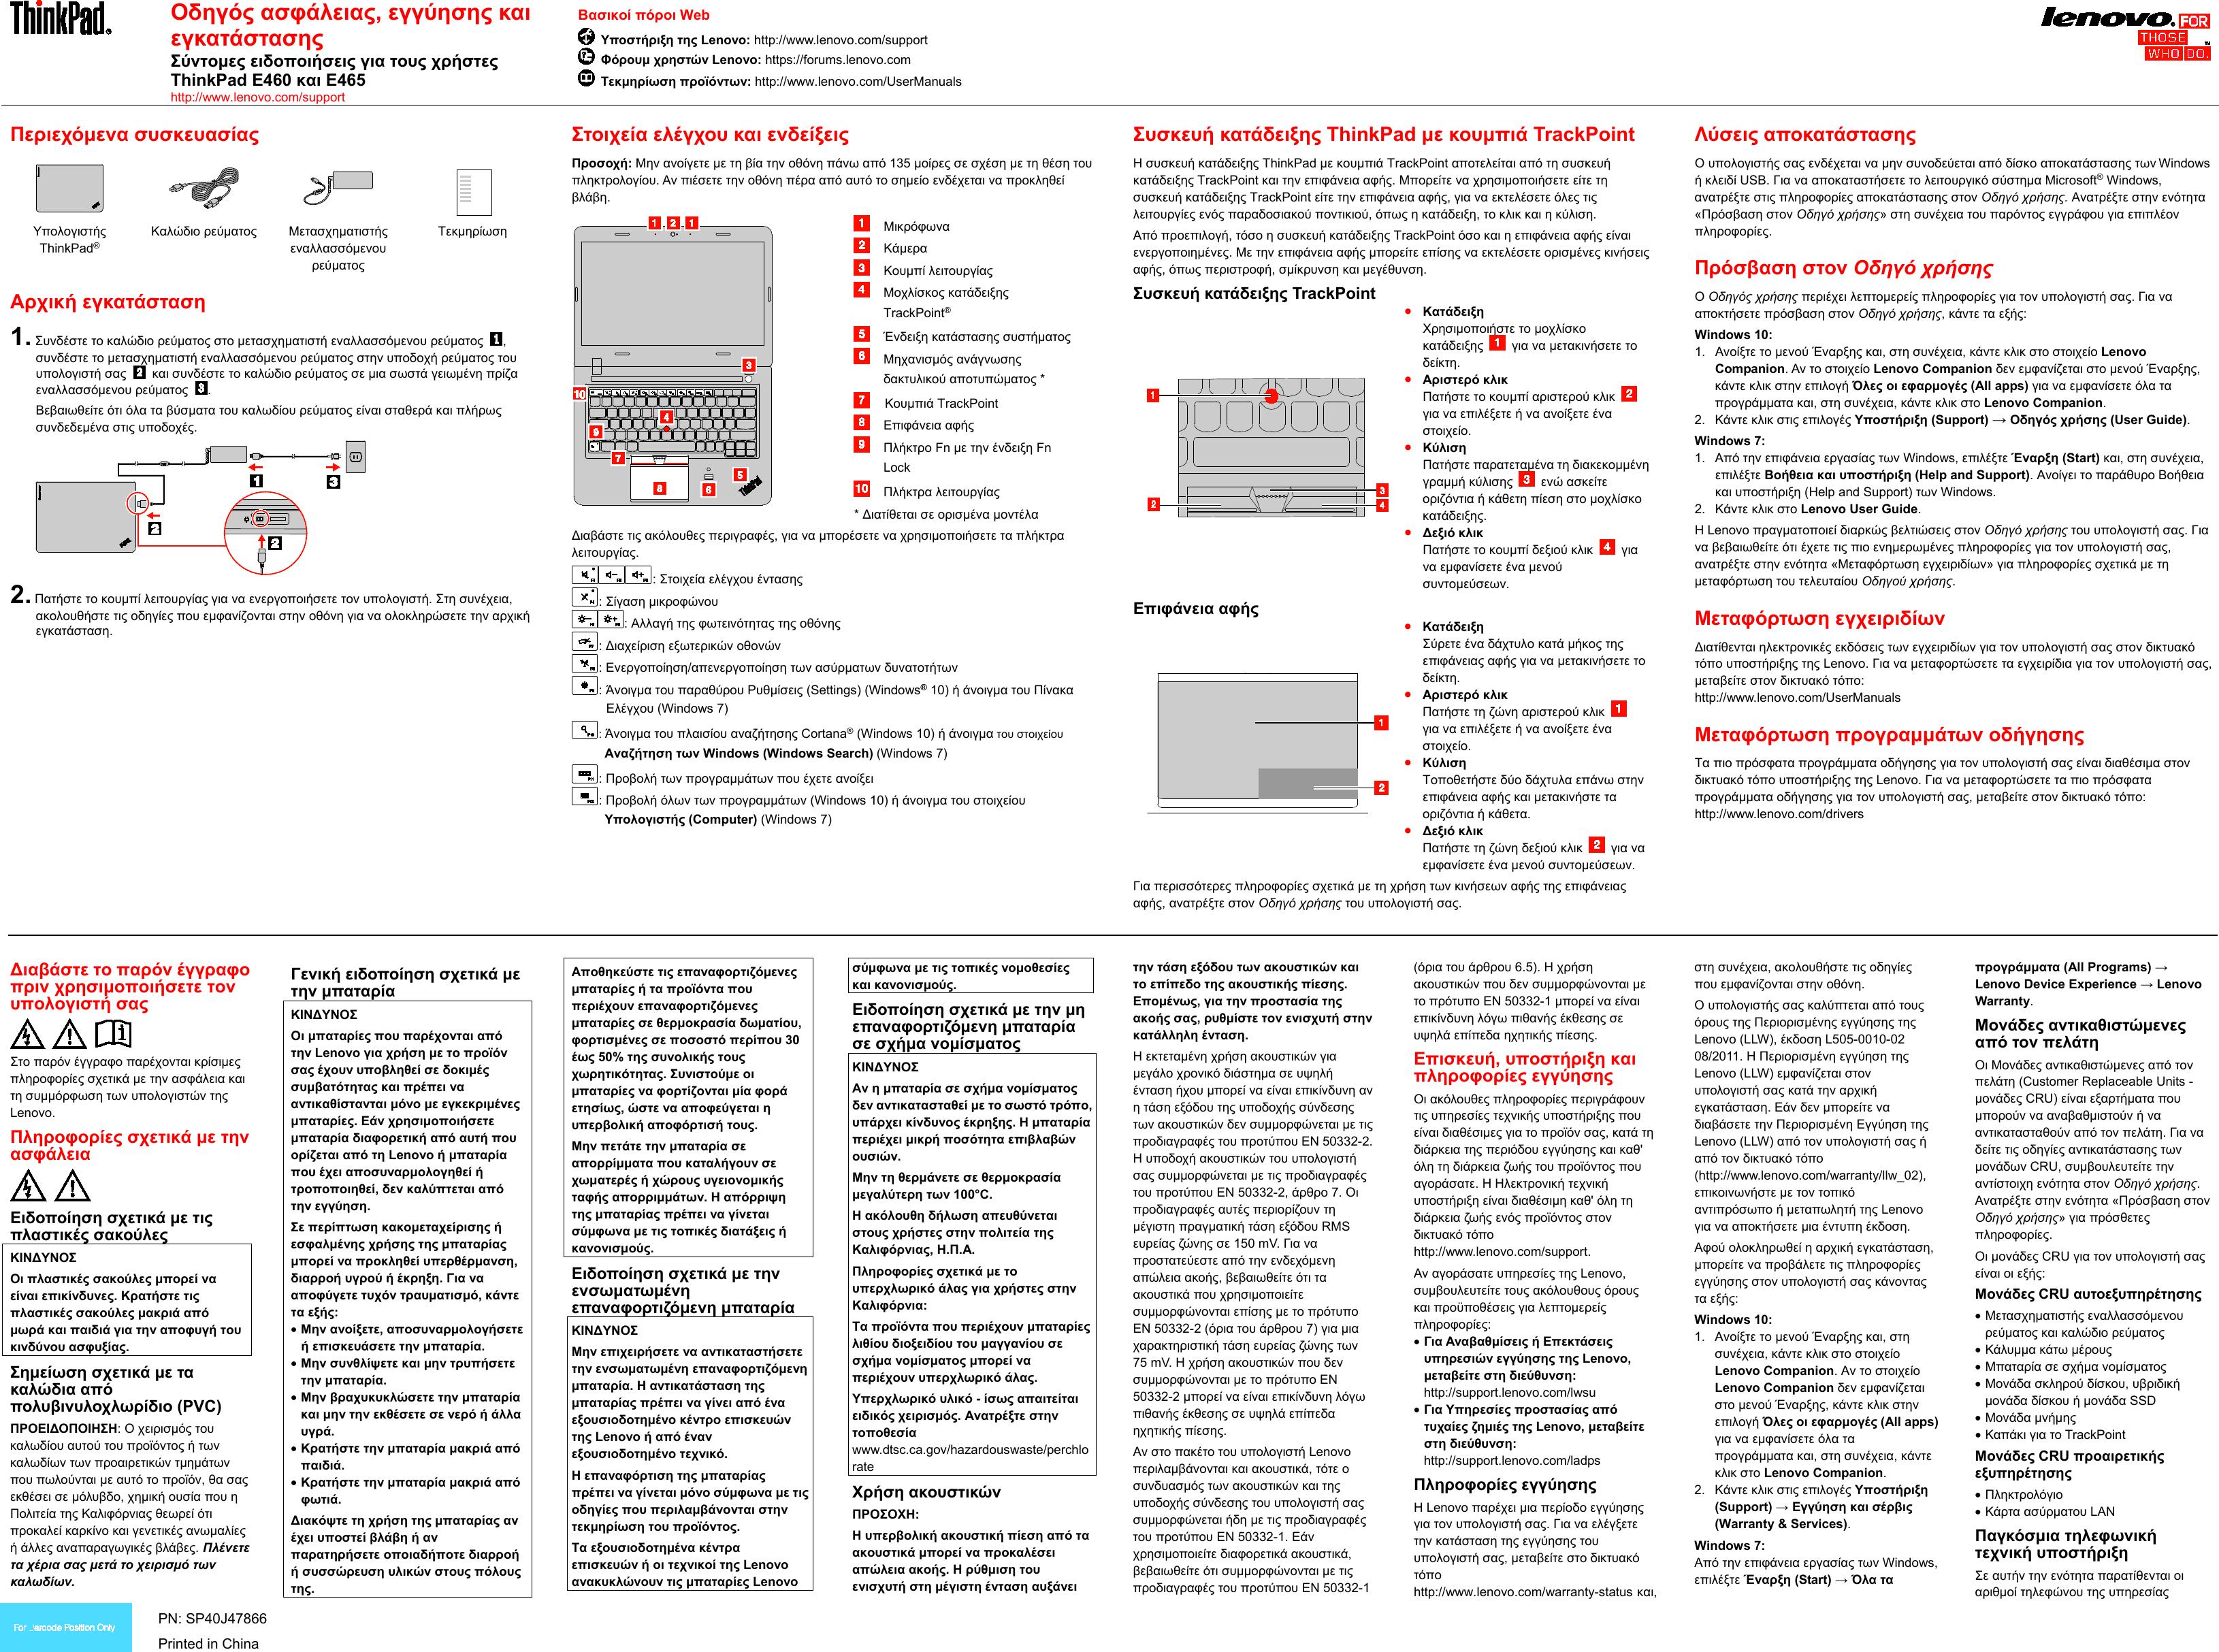 ae1206590d3 Lenovo E460 E465 Swsg El Sp40J47866 User Manual (Greek) Safety, Warranty  And Setup Guide Think Pad E460, (Think Pad) Type 20EU